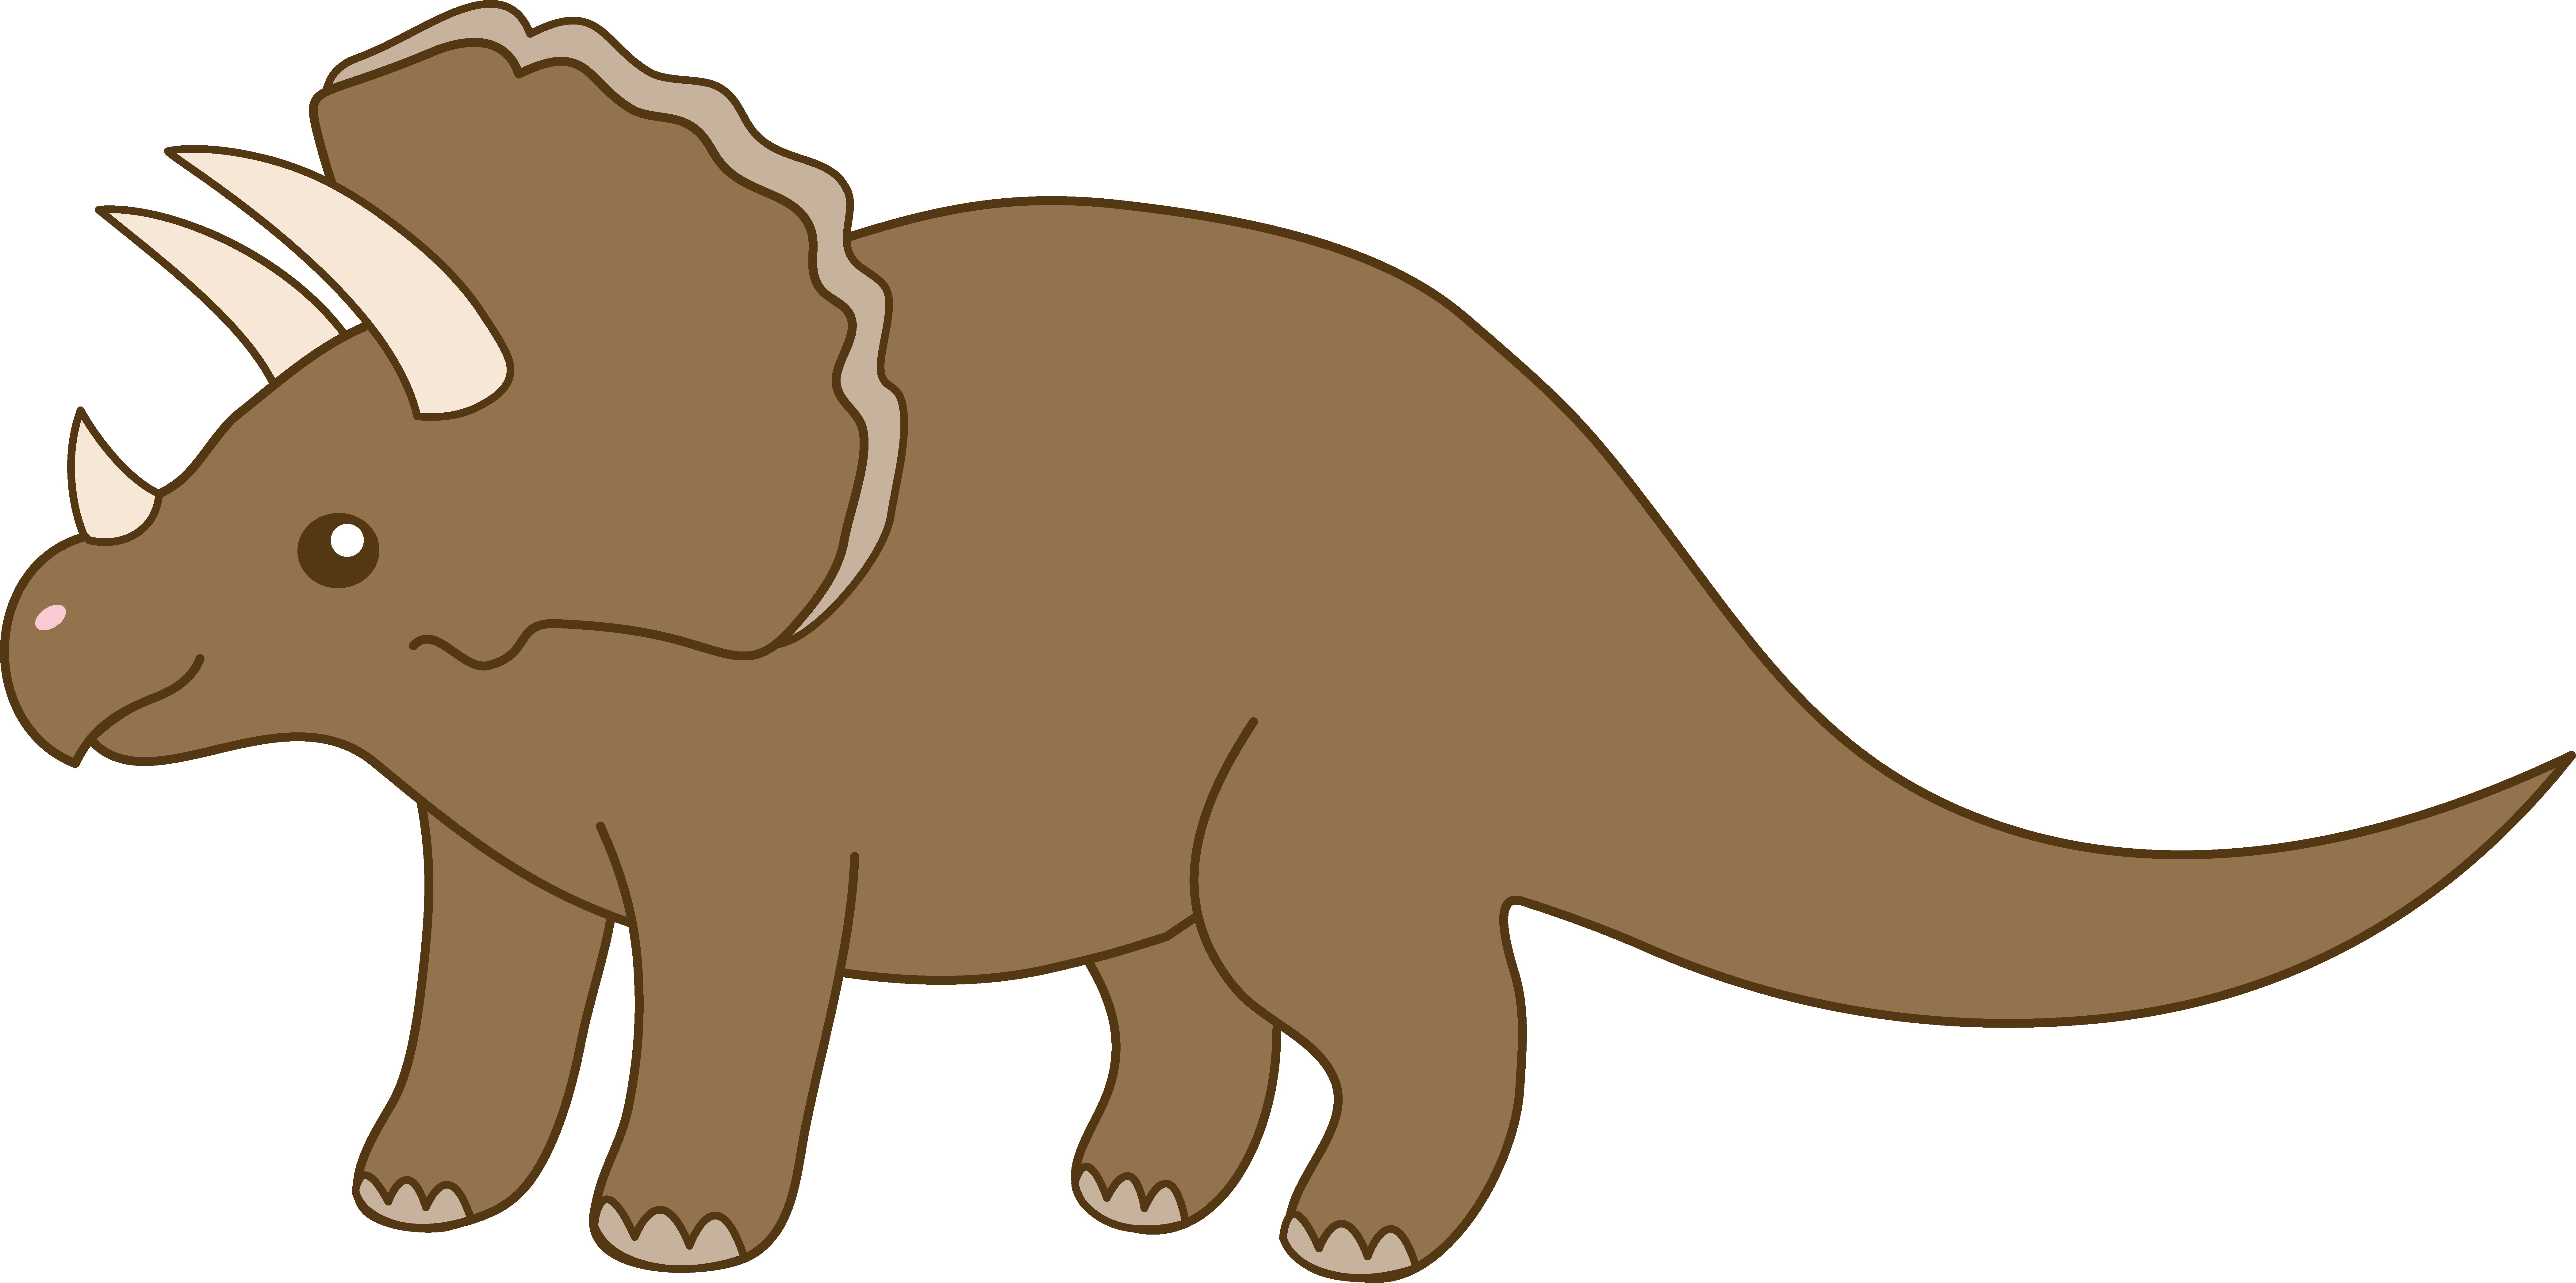 Dinosaur Clip Art For Pre Free Clipart I-Dinosaur clip art for pre free clipart images-5